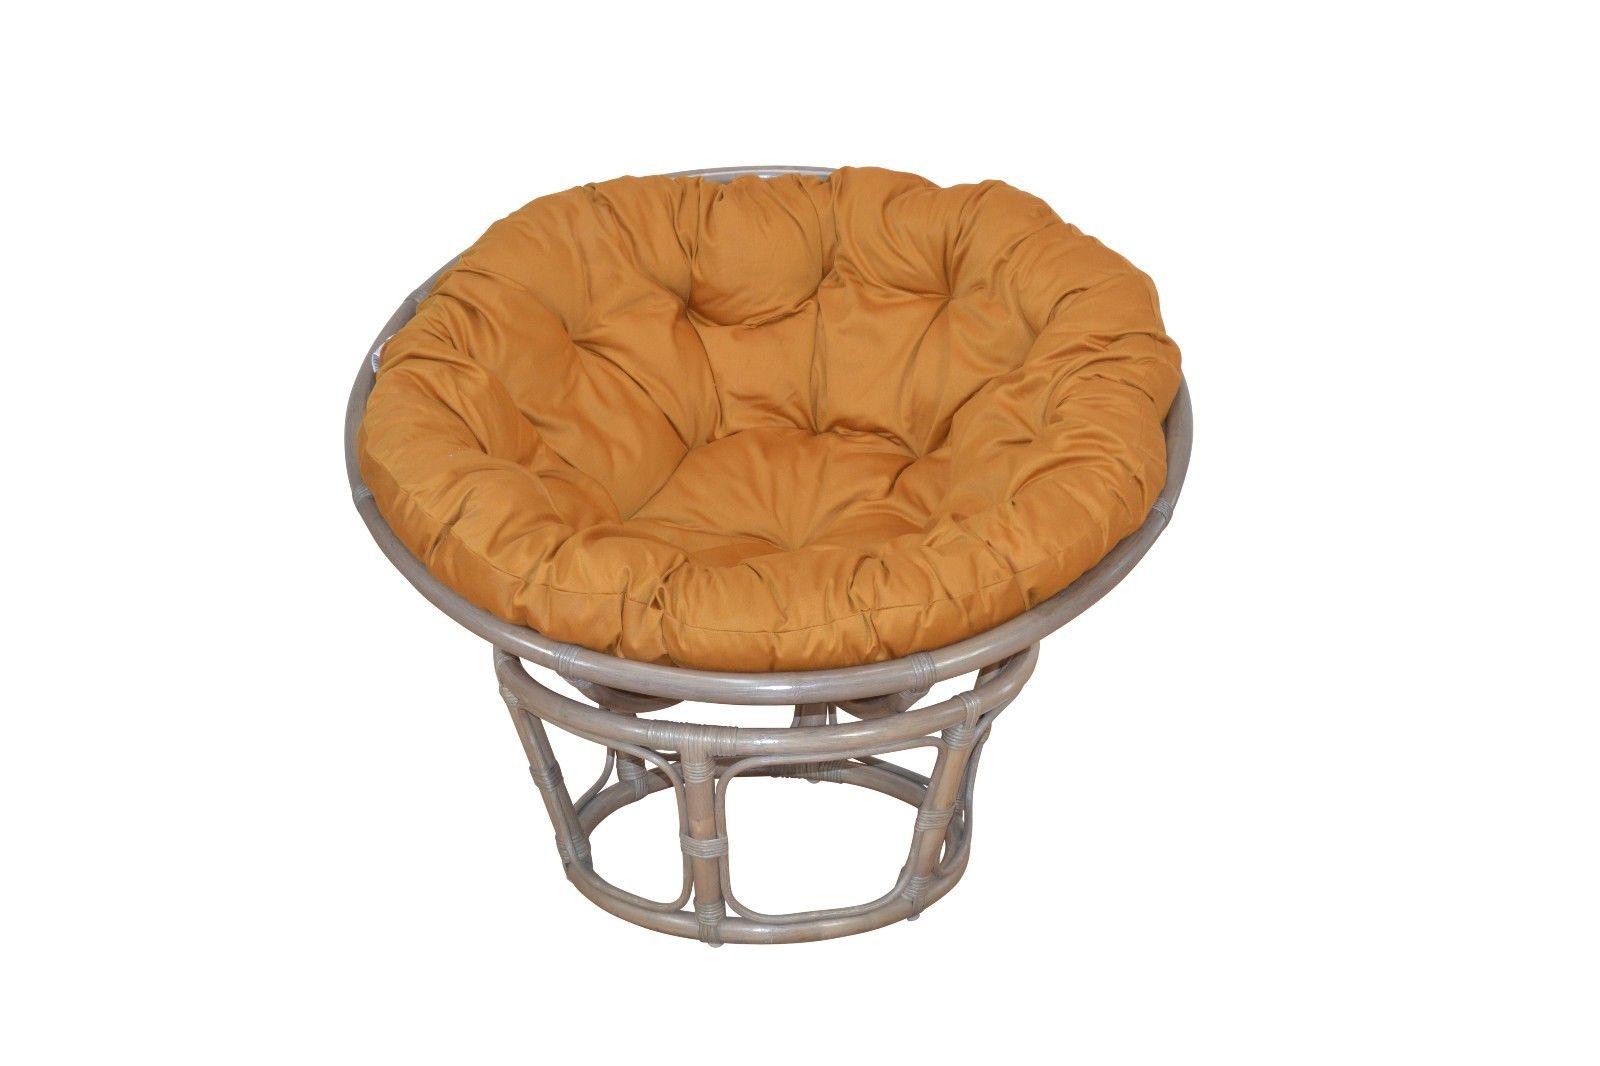 korbsessel grau siena garden ballina polyrattan grau dining chair with korbsessel grau. Black Bedroom Furniture Sets. Home Design Ideas